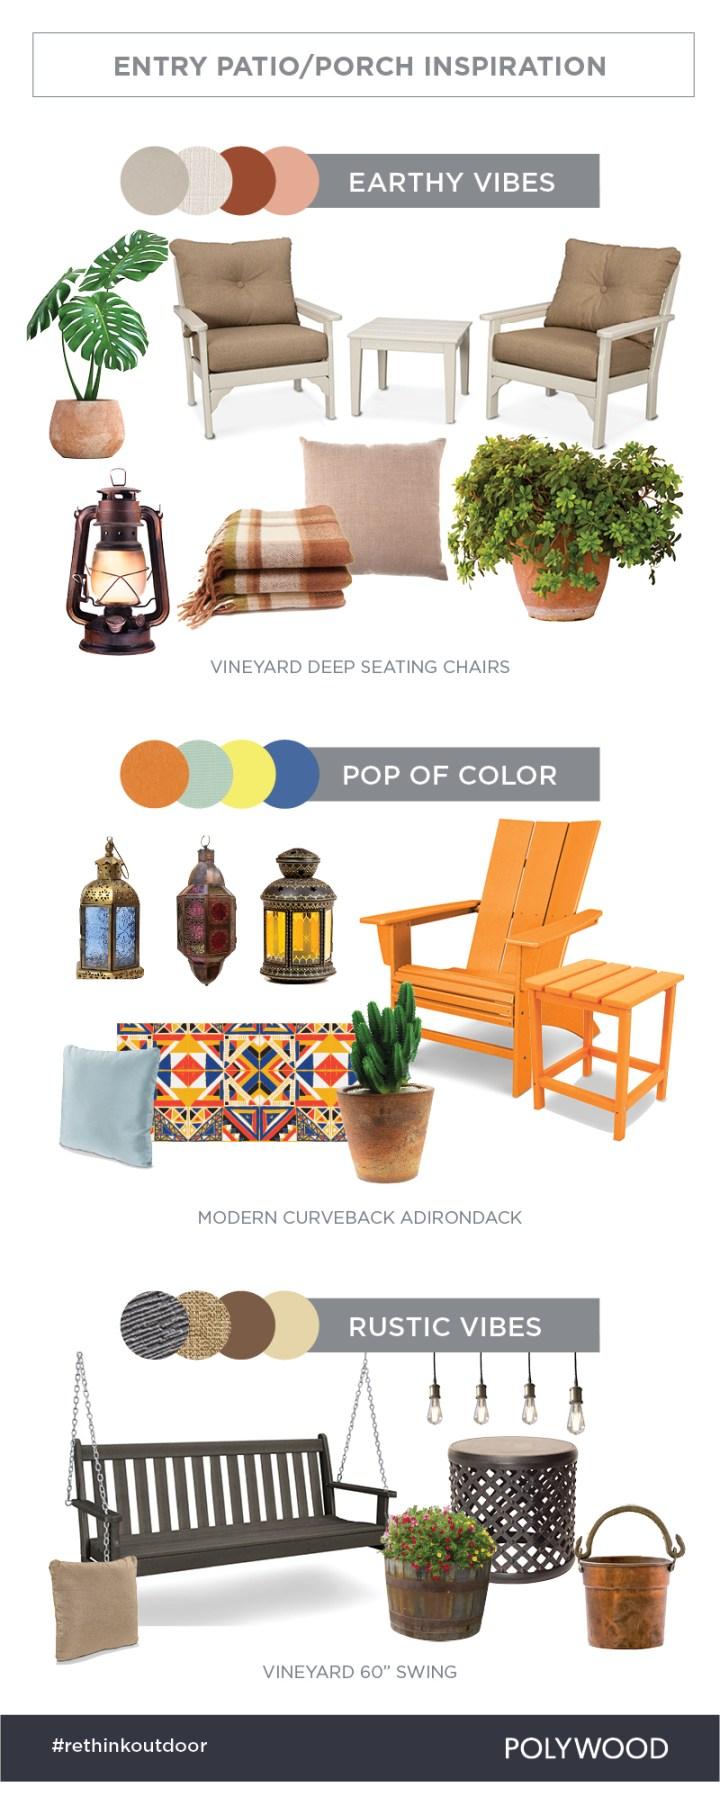 PolyWood Porch Inspiration